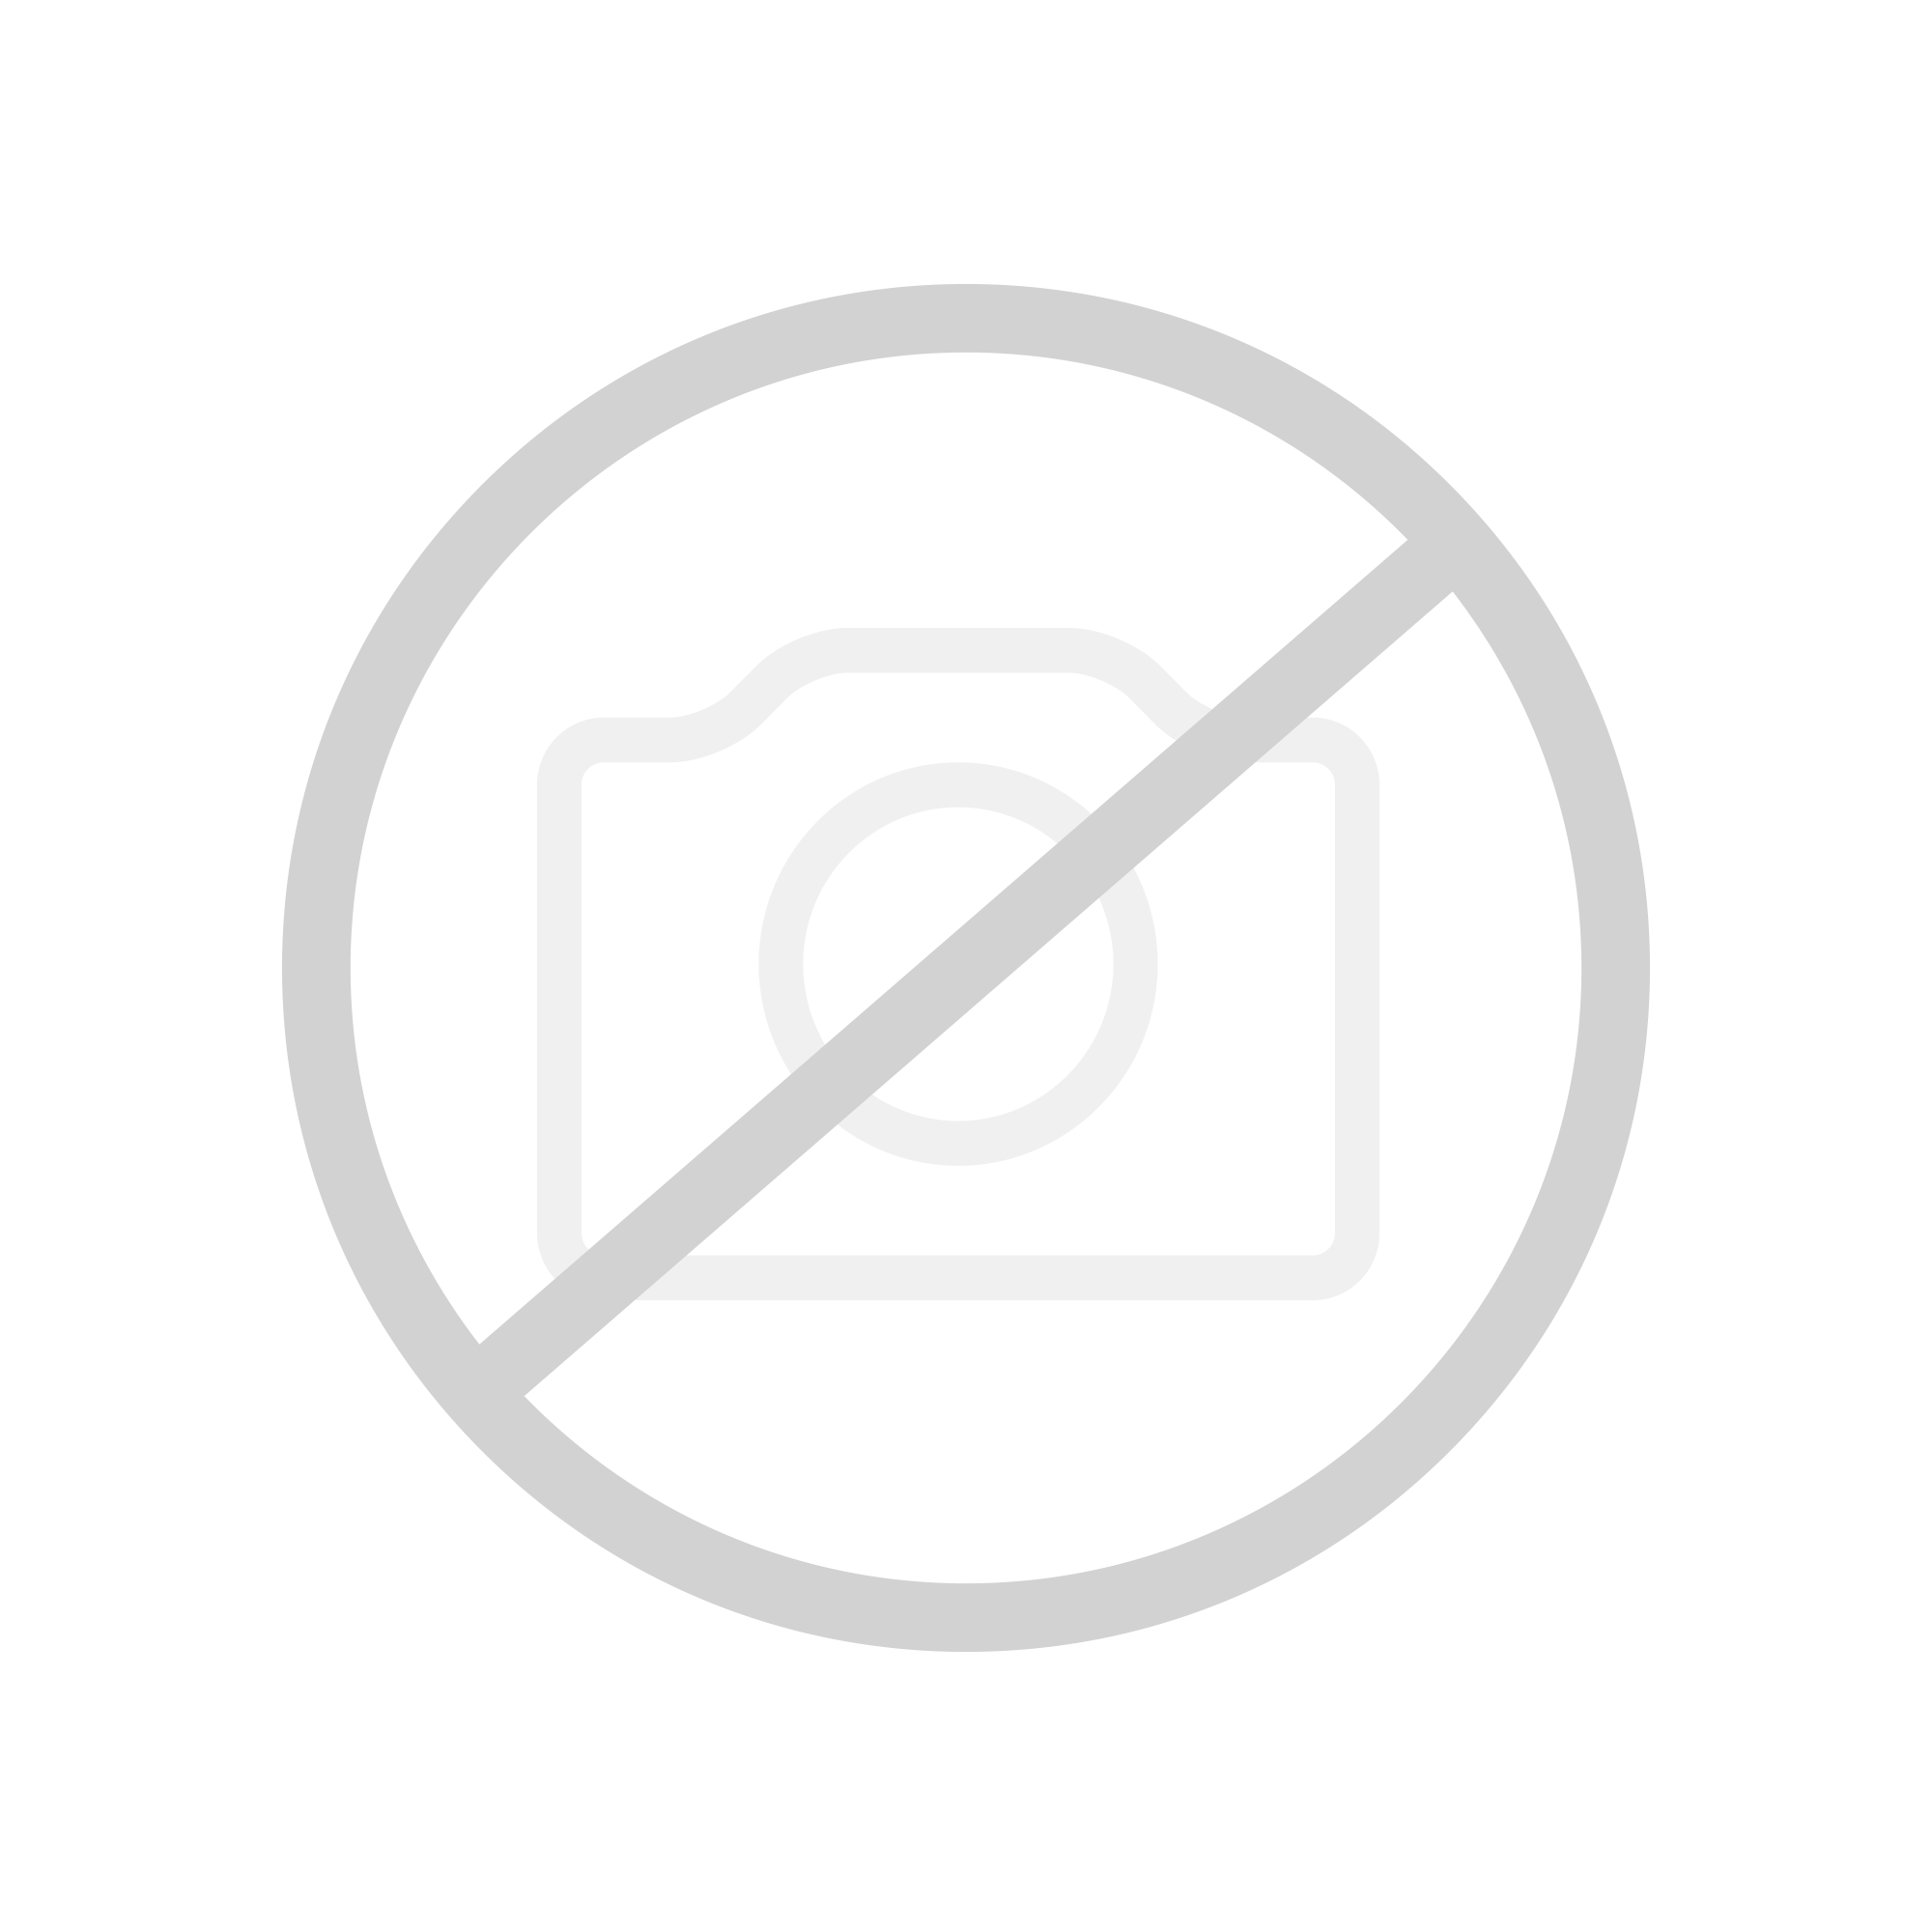 Geberit AP-Spülkasten AP127 mit Spül-Stopp-Spülung, für Druckspüler